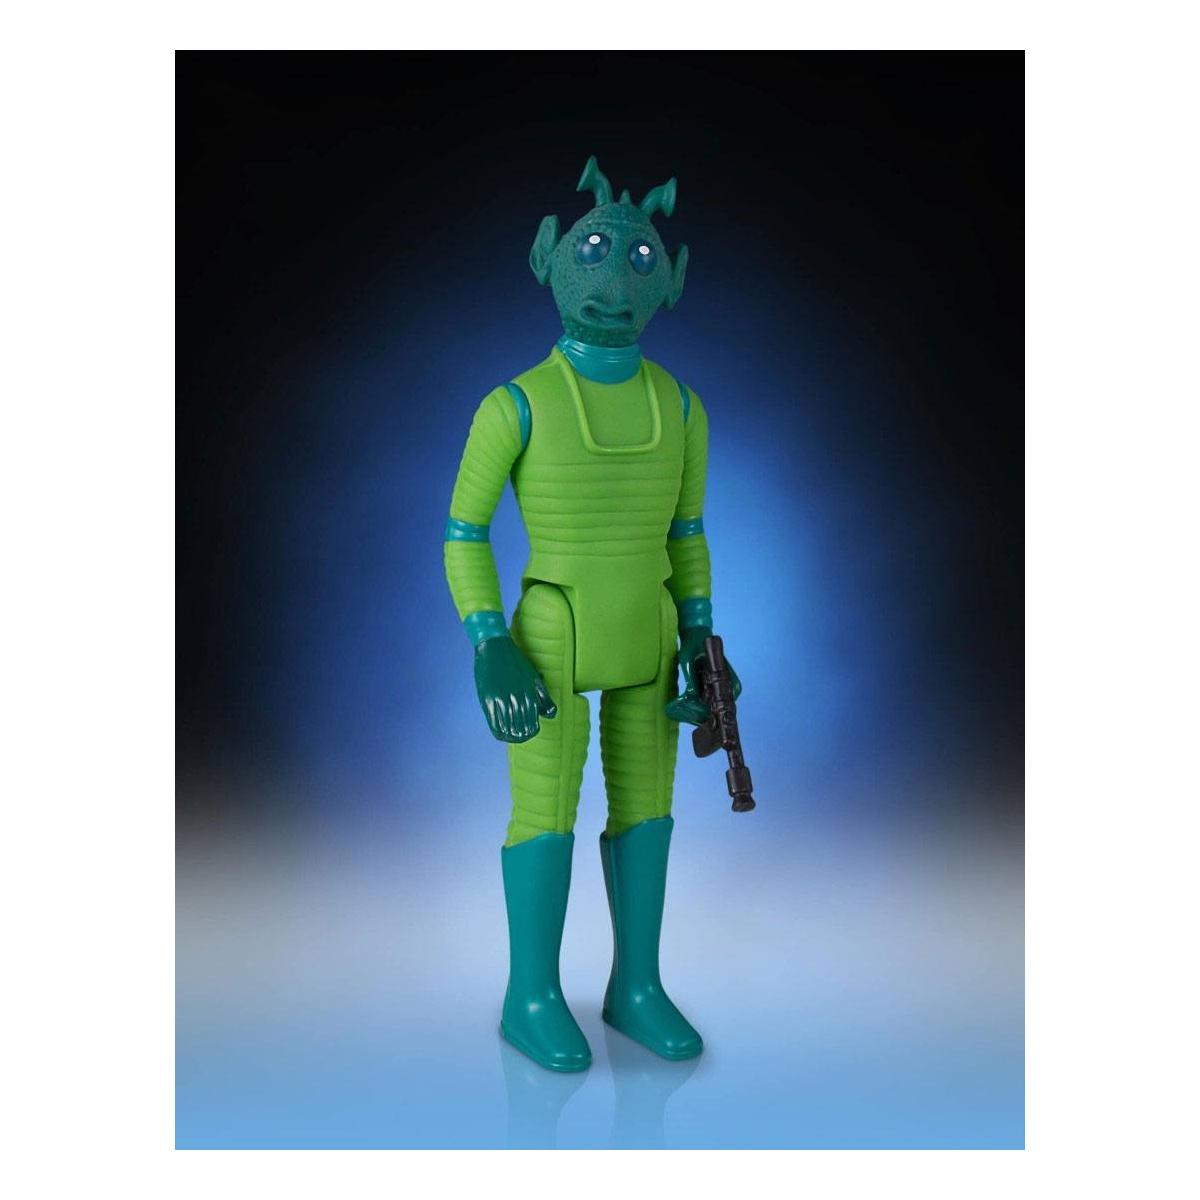 star wars potf figurine jumbo kenner greedo 30 cm figurine discount. Black Bedroom Furniture Sets. Home Design Ideas